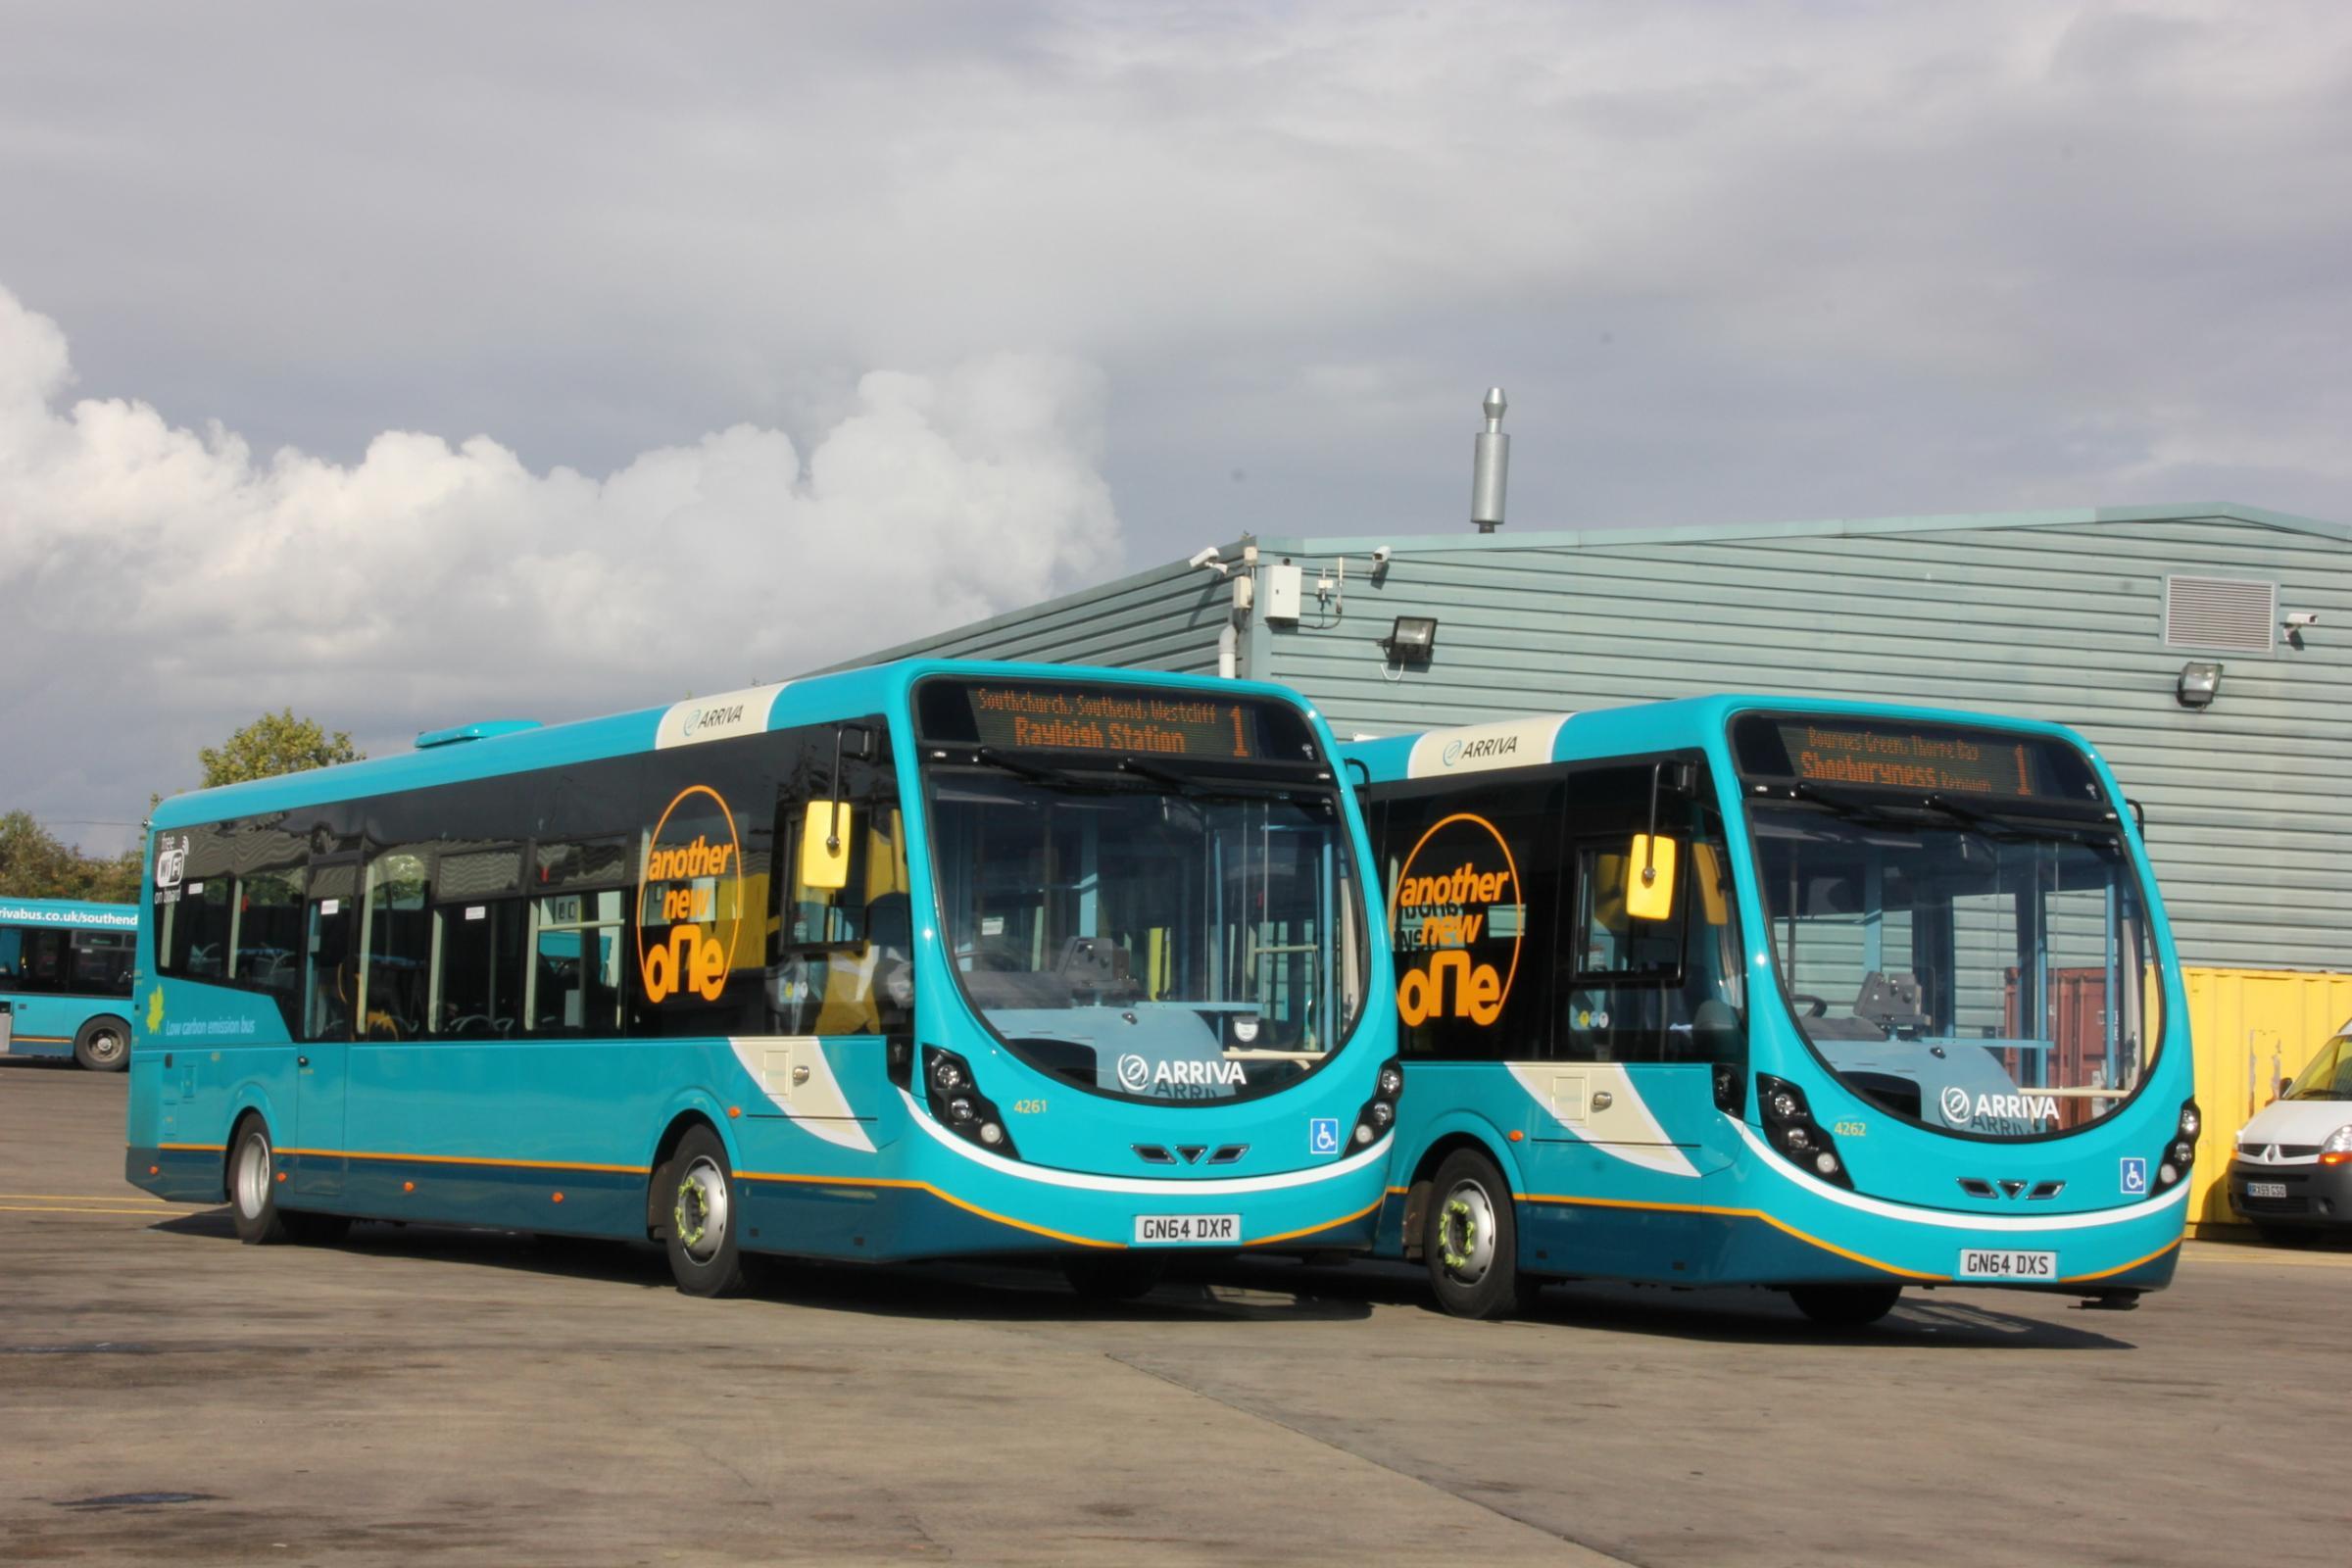 Free bus travel is up for grabs - Bradford news - NewsLocker.